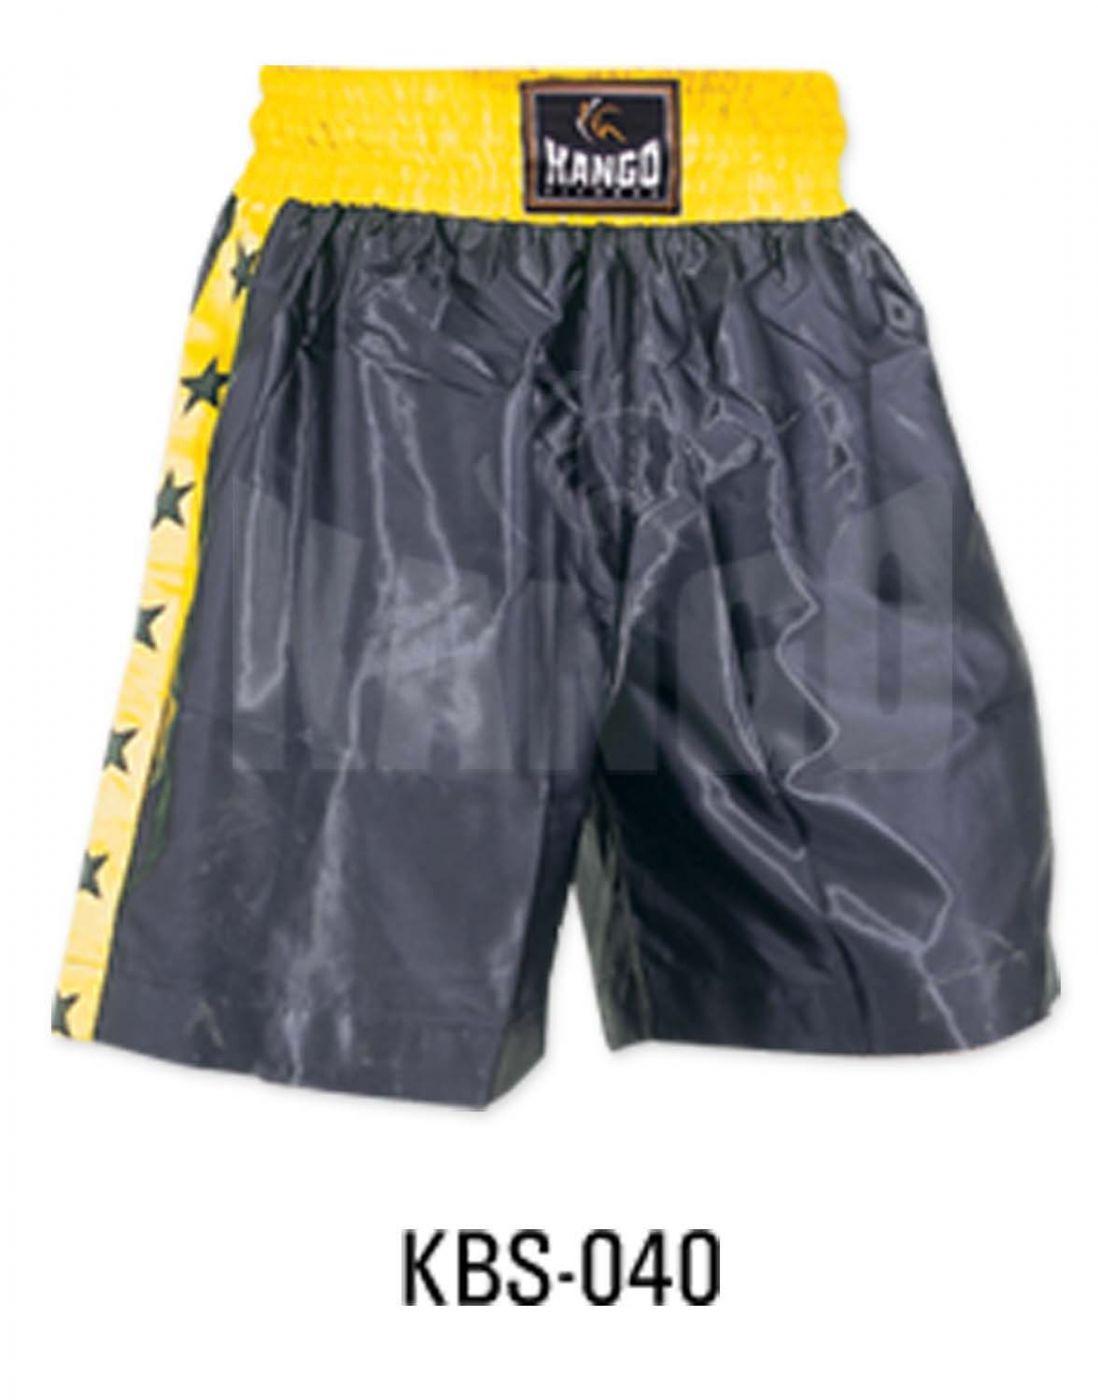 Шорты боксерские черно-желтые со звездочками, артикул 6900, размер S, KANGO